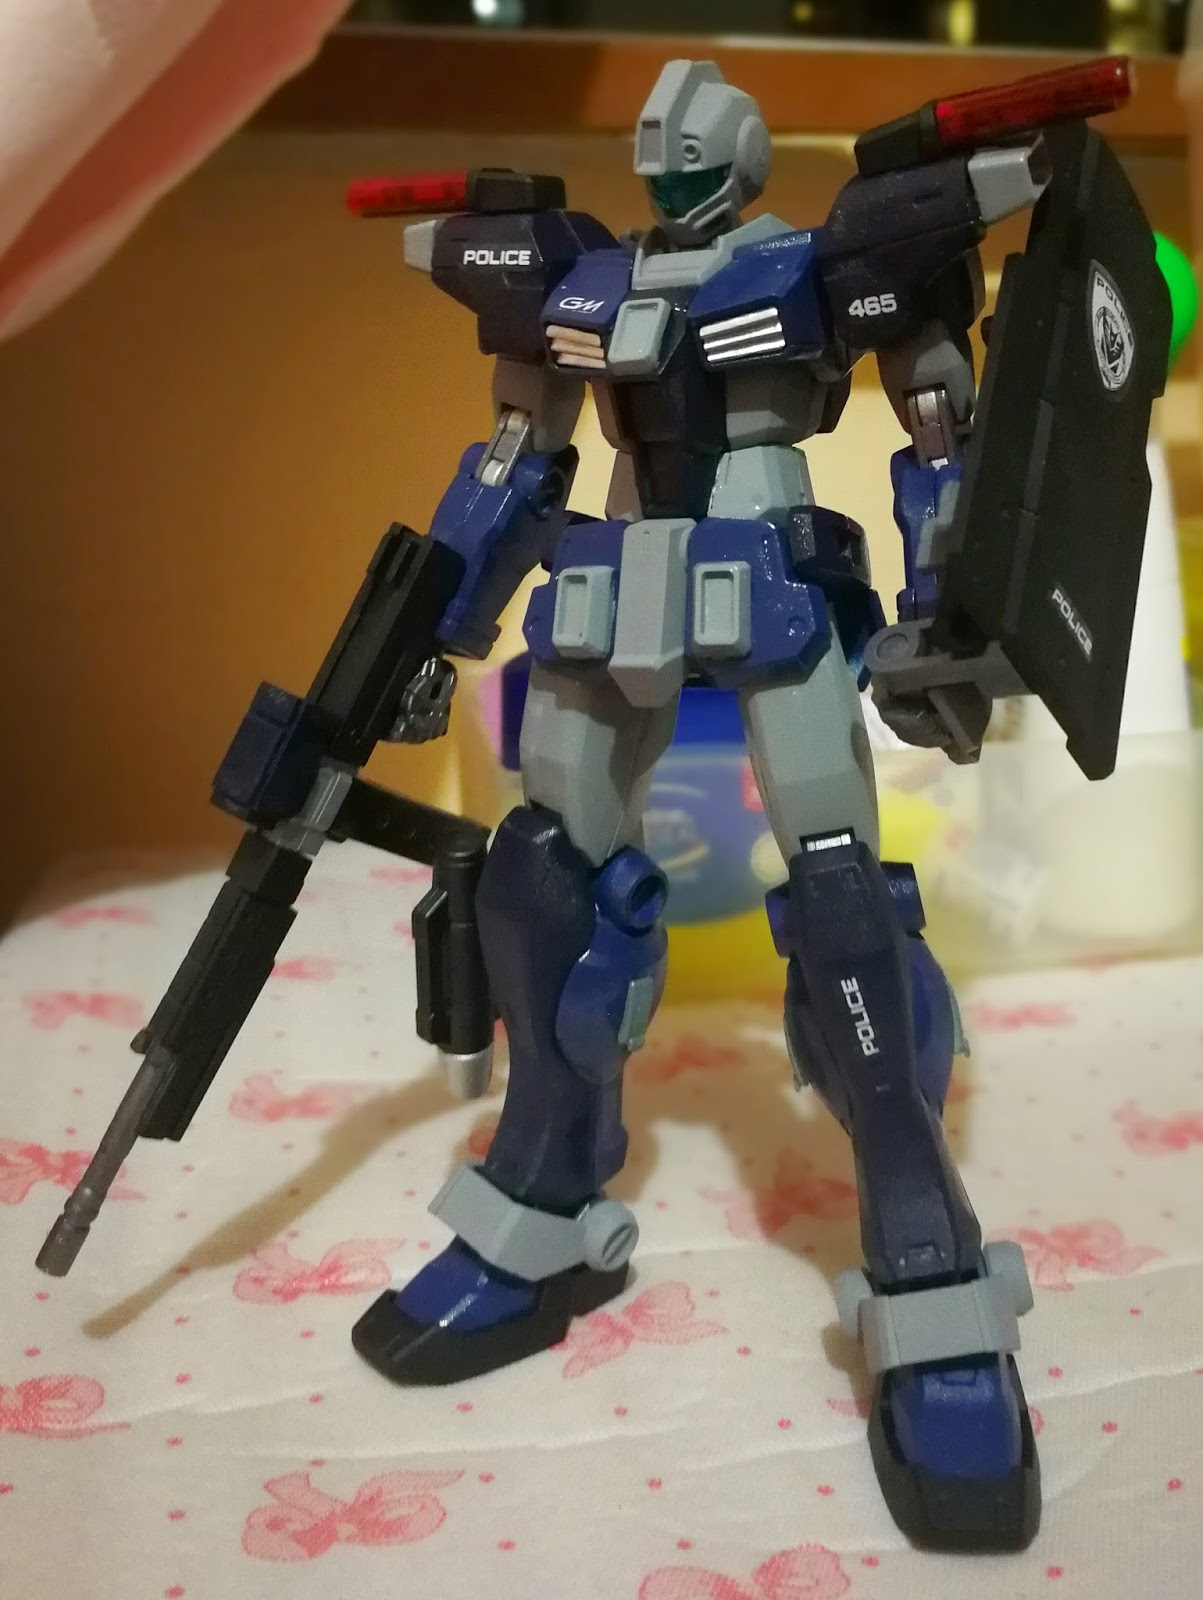 Gunplanerd: [CUSTOM] Bandai HGUC 1/144 RGM-79G/FP GM Command